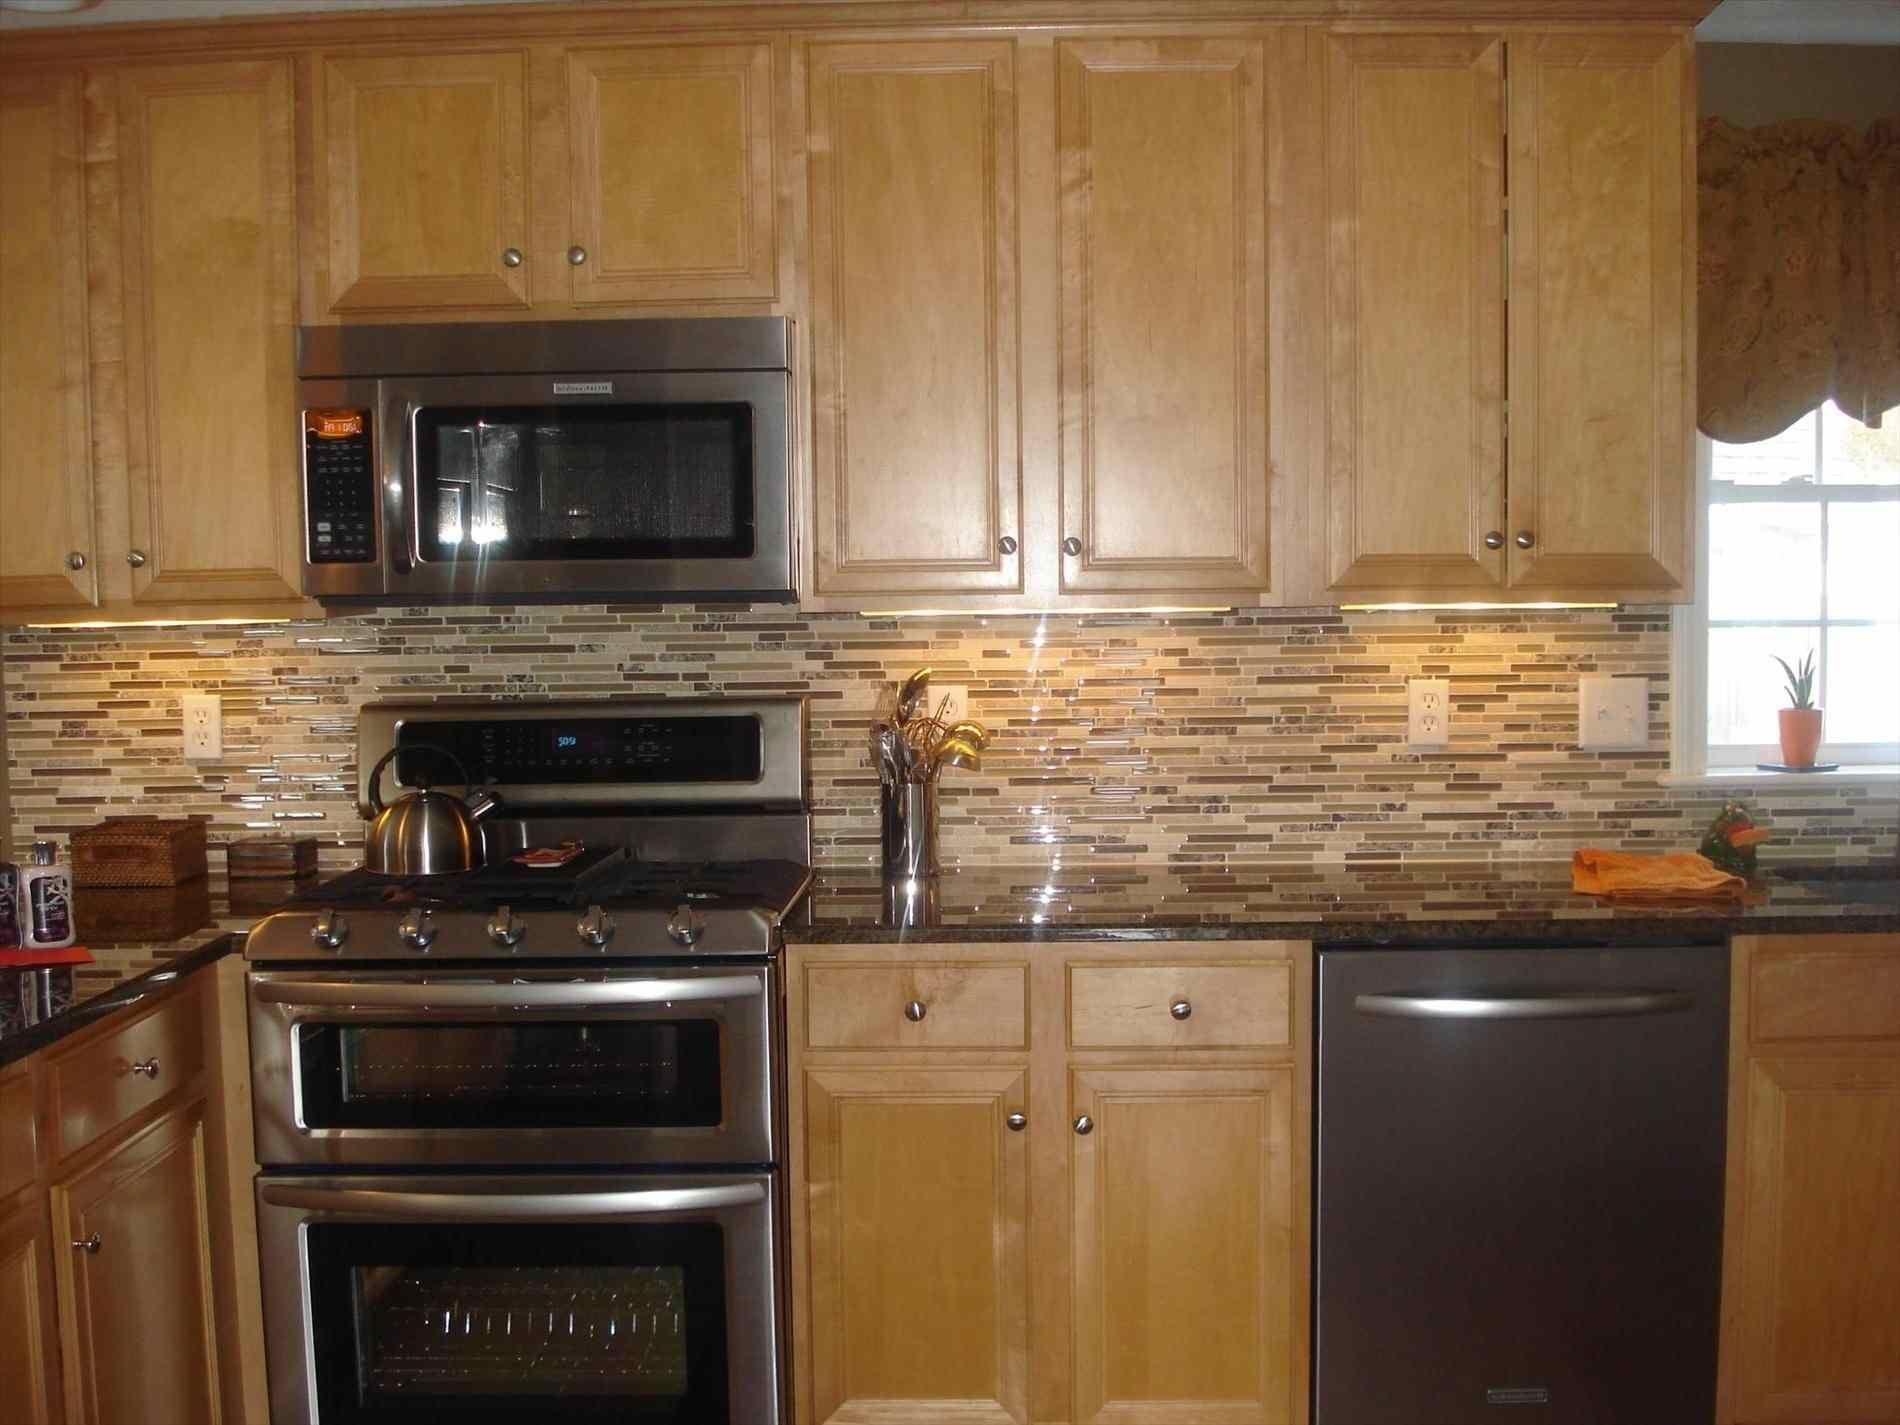 light oak cabinets dark countertops | DeducTour.com ... on Light Maple Cabinets With Black Countertops  id=97777